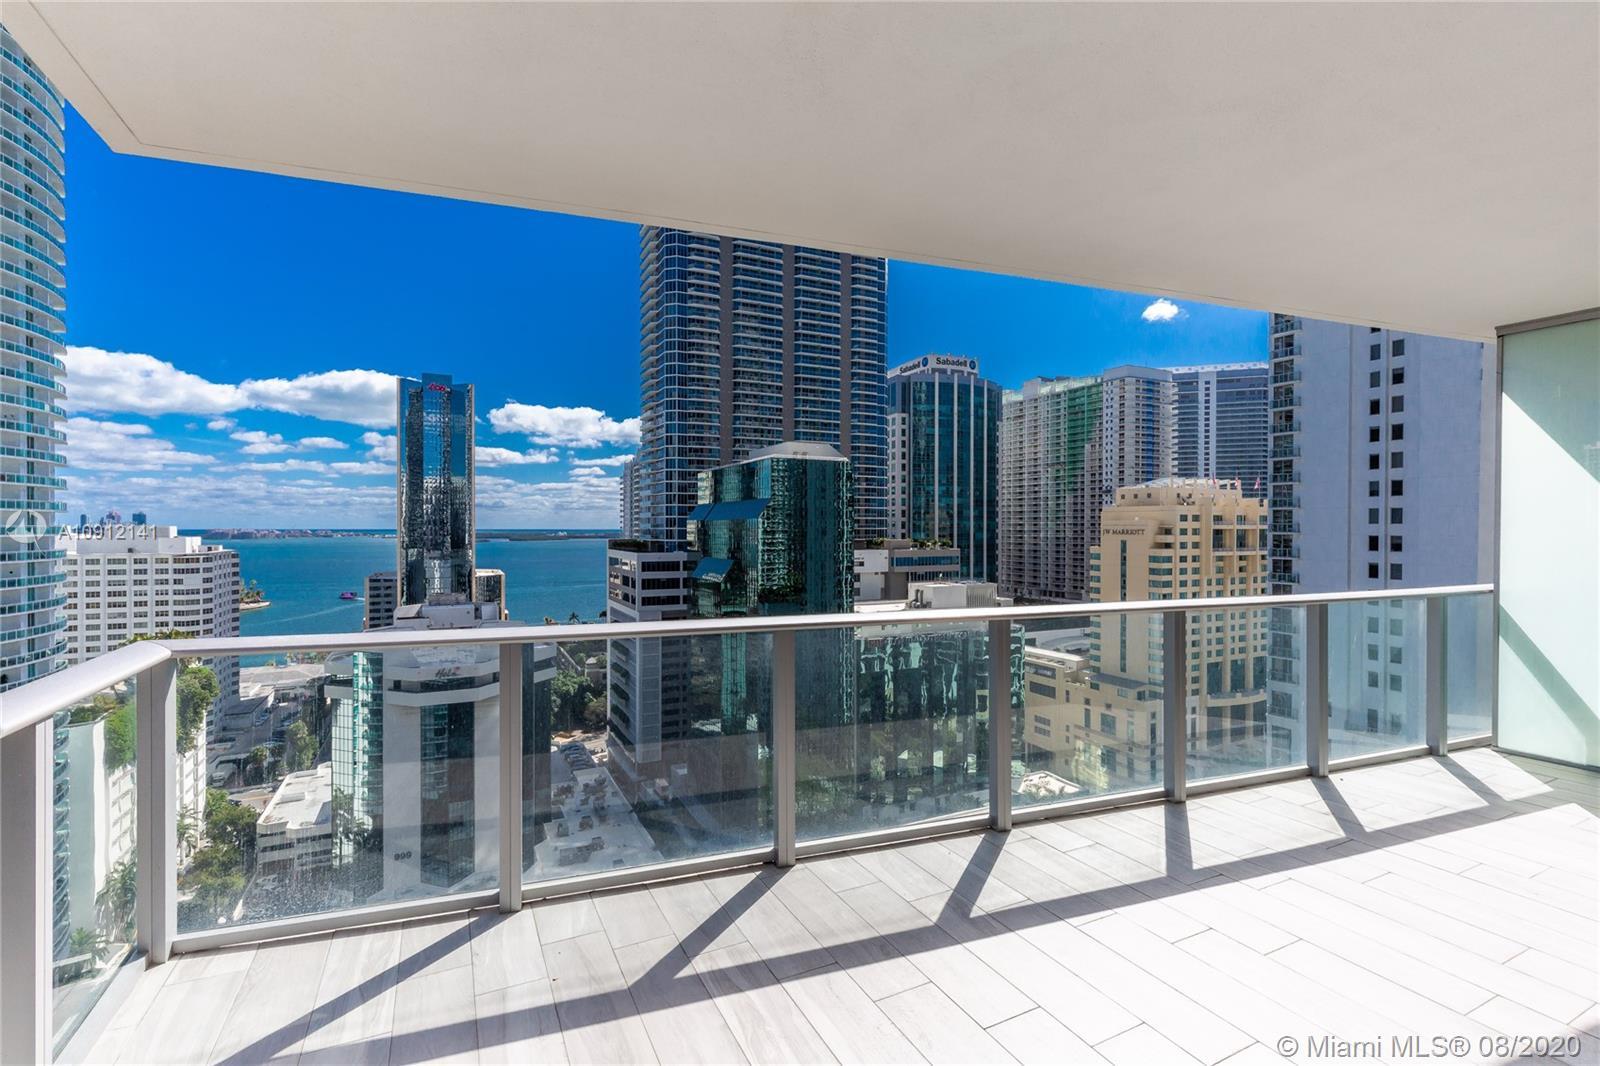 1010 Brickell #2101 - 1010 Brickell Ave #2101, Miami, FL 33131